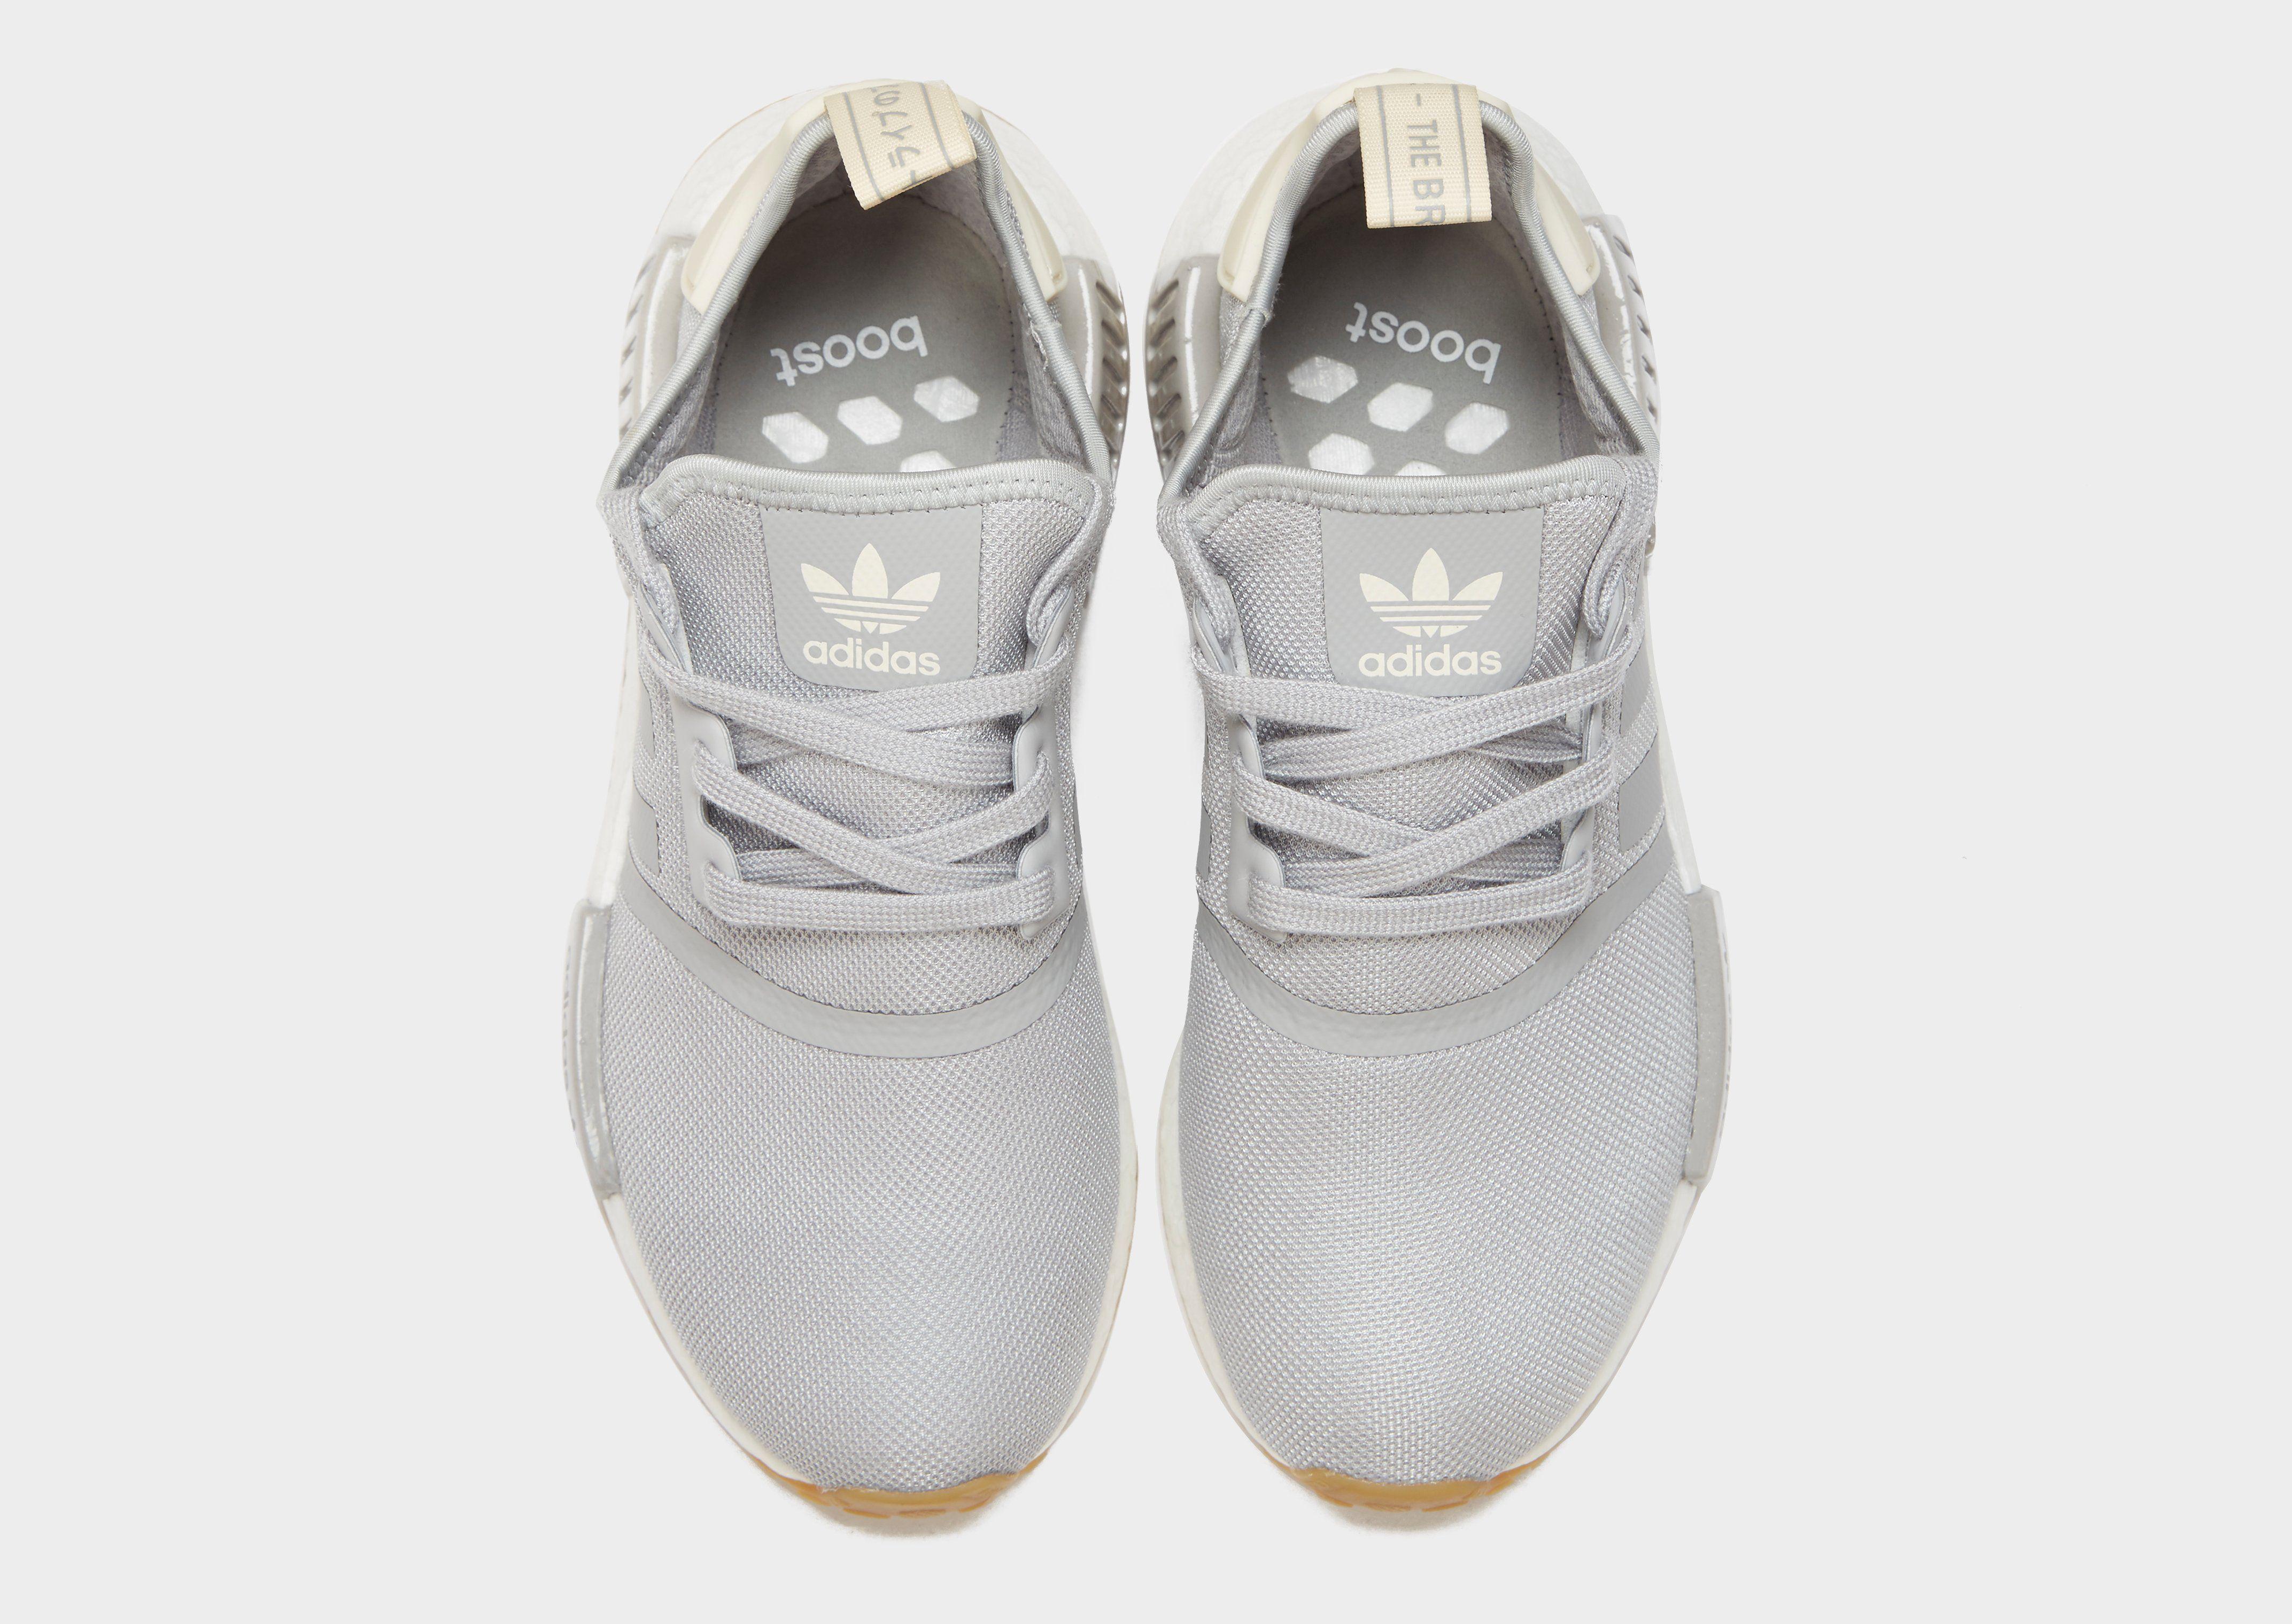 adidas Originals NMD_R1 Women's